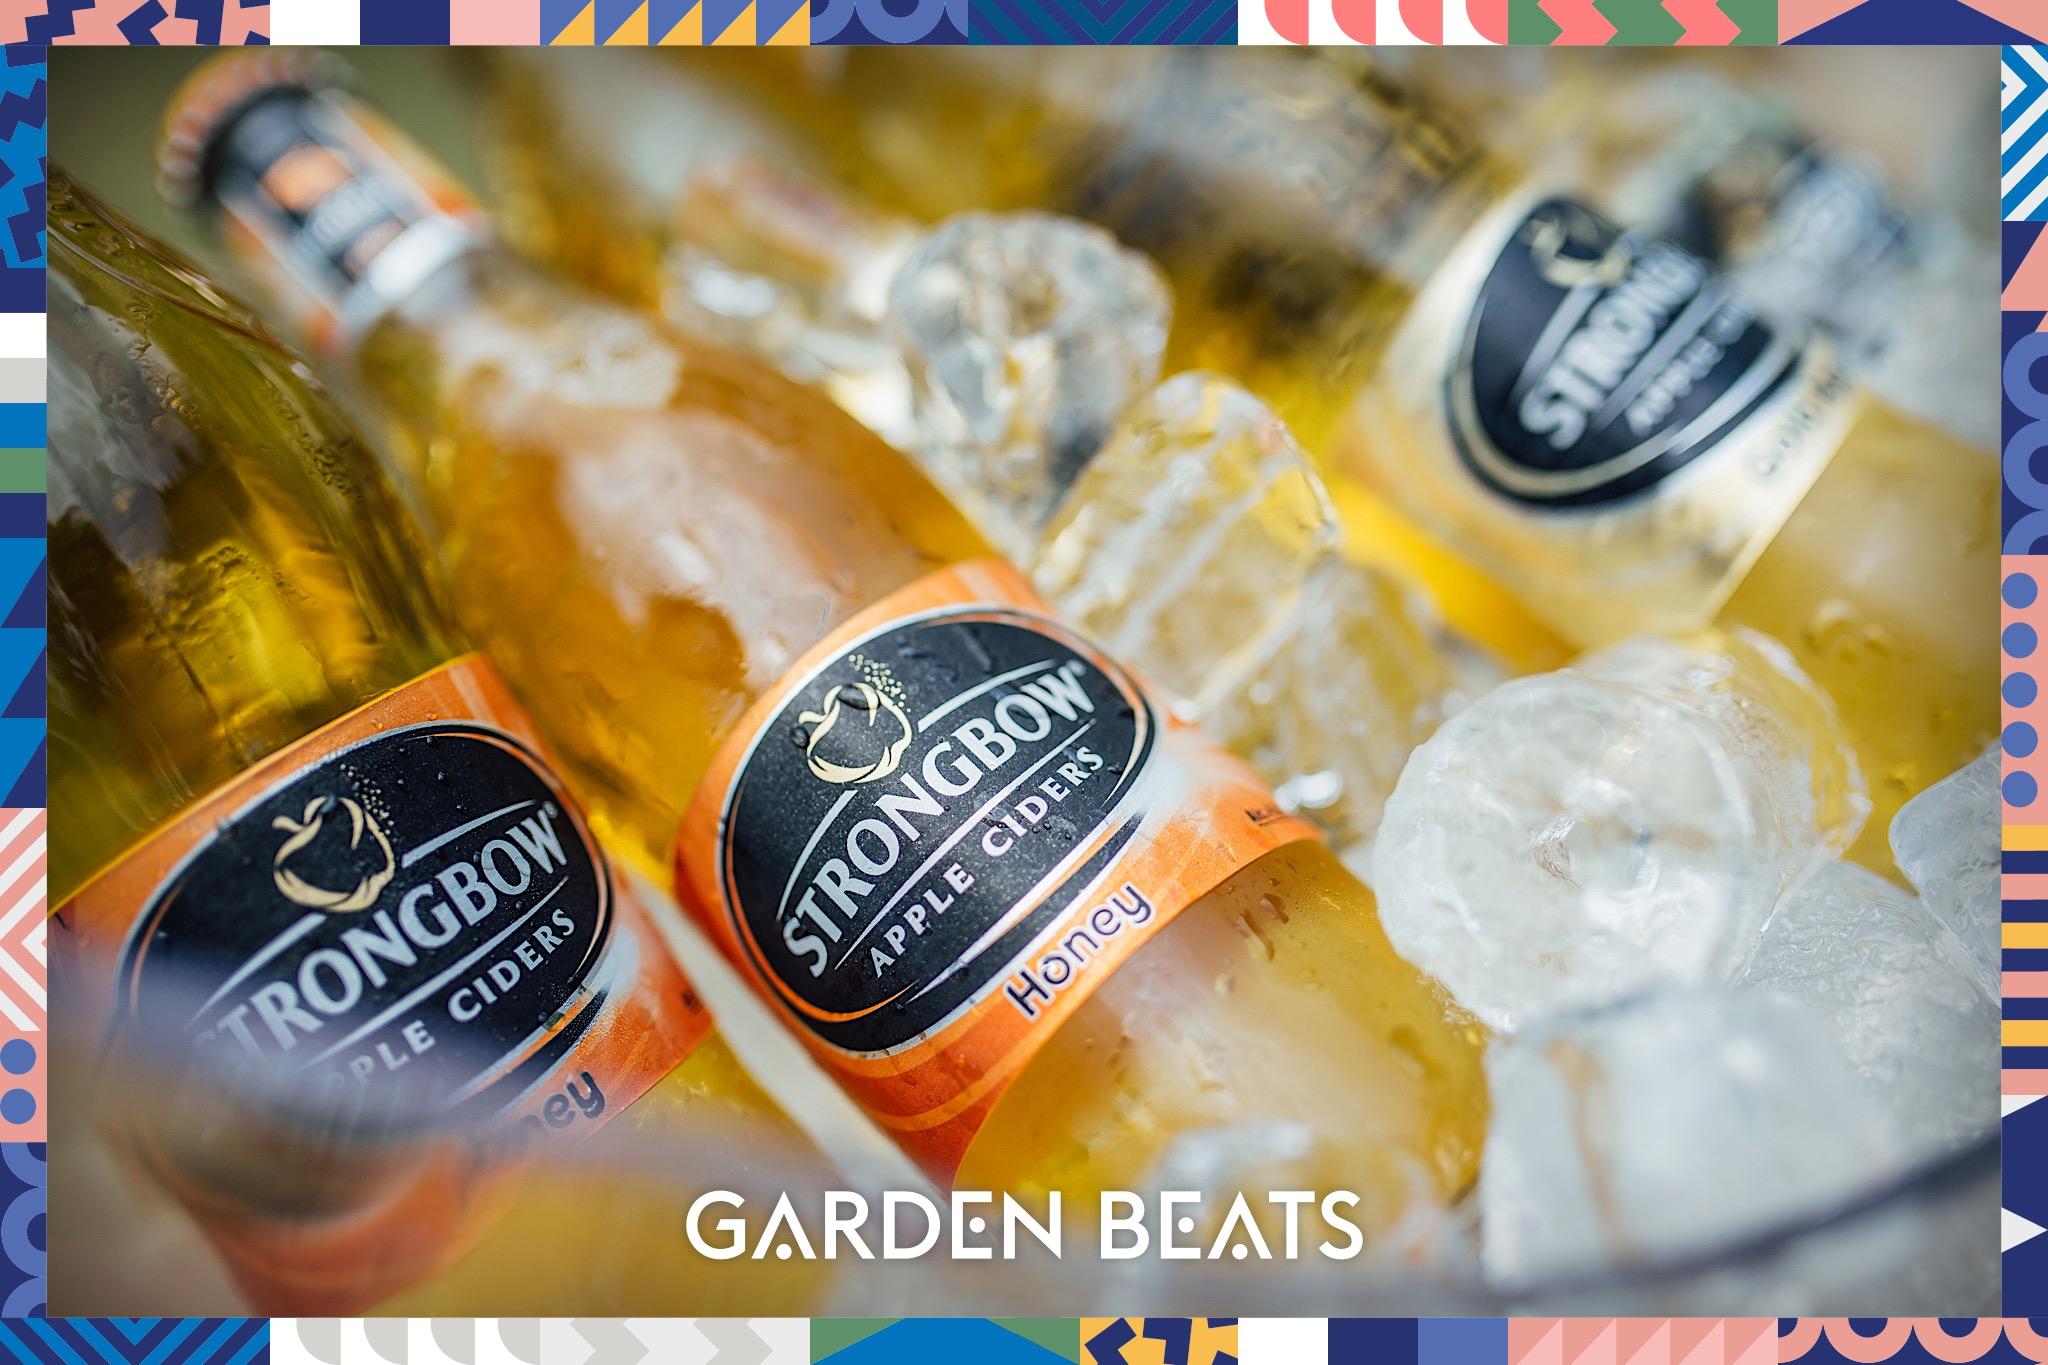 18032017_GardenBeats_Colossal148_WatermarkedGB.jpg